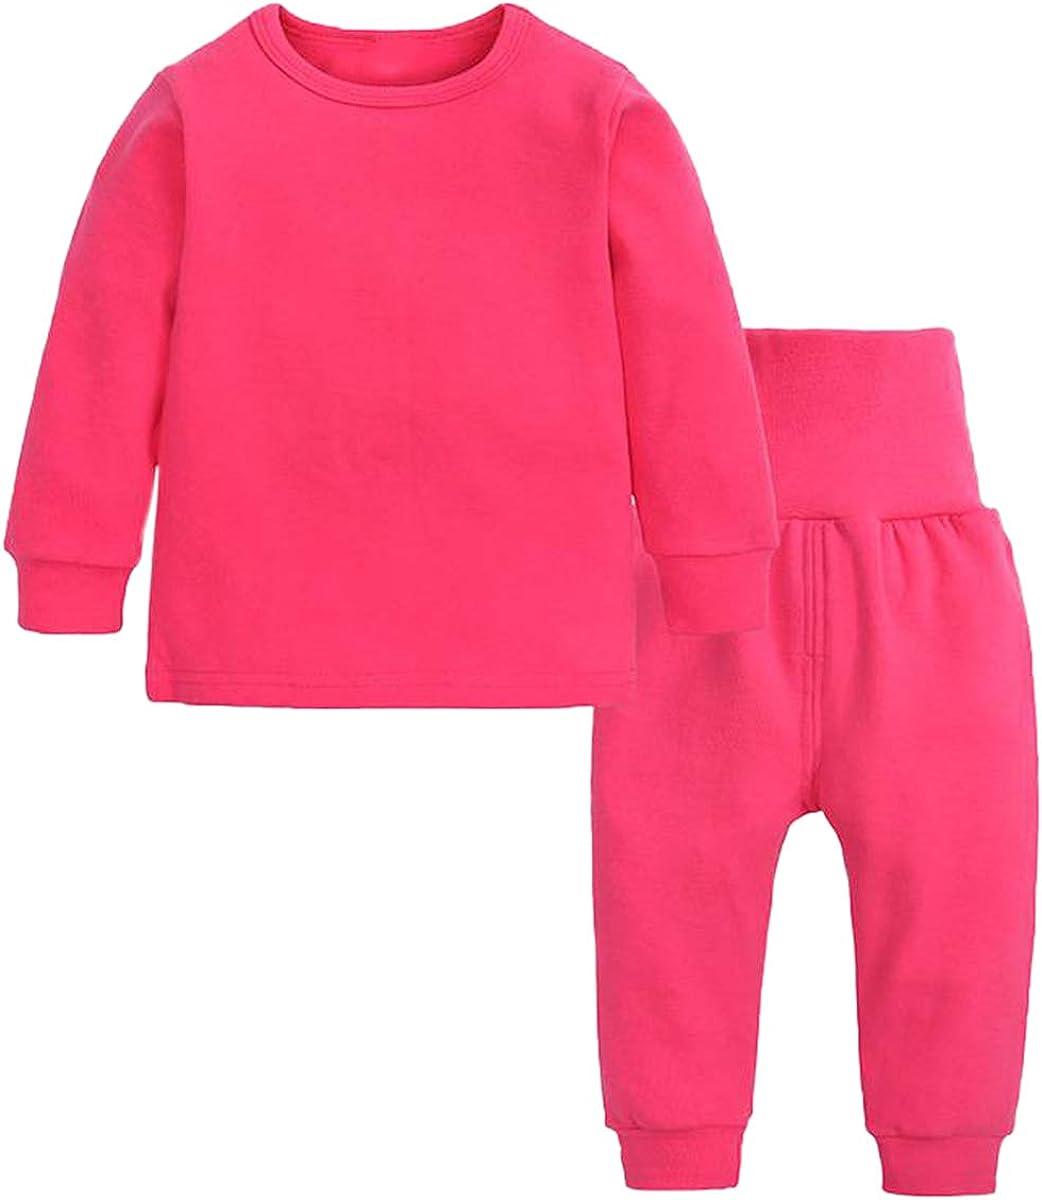 Toddler Girl's Thermal Underwear Set Base Layer Top & Bottom Set, Pink, 18-24 Months = Tag 100